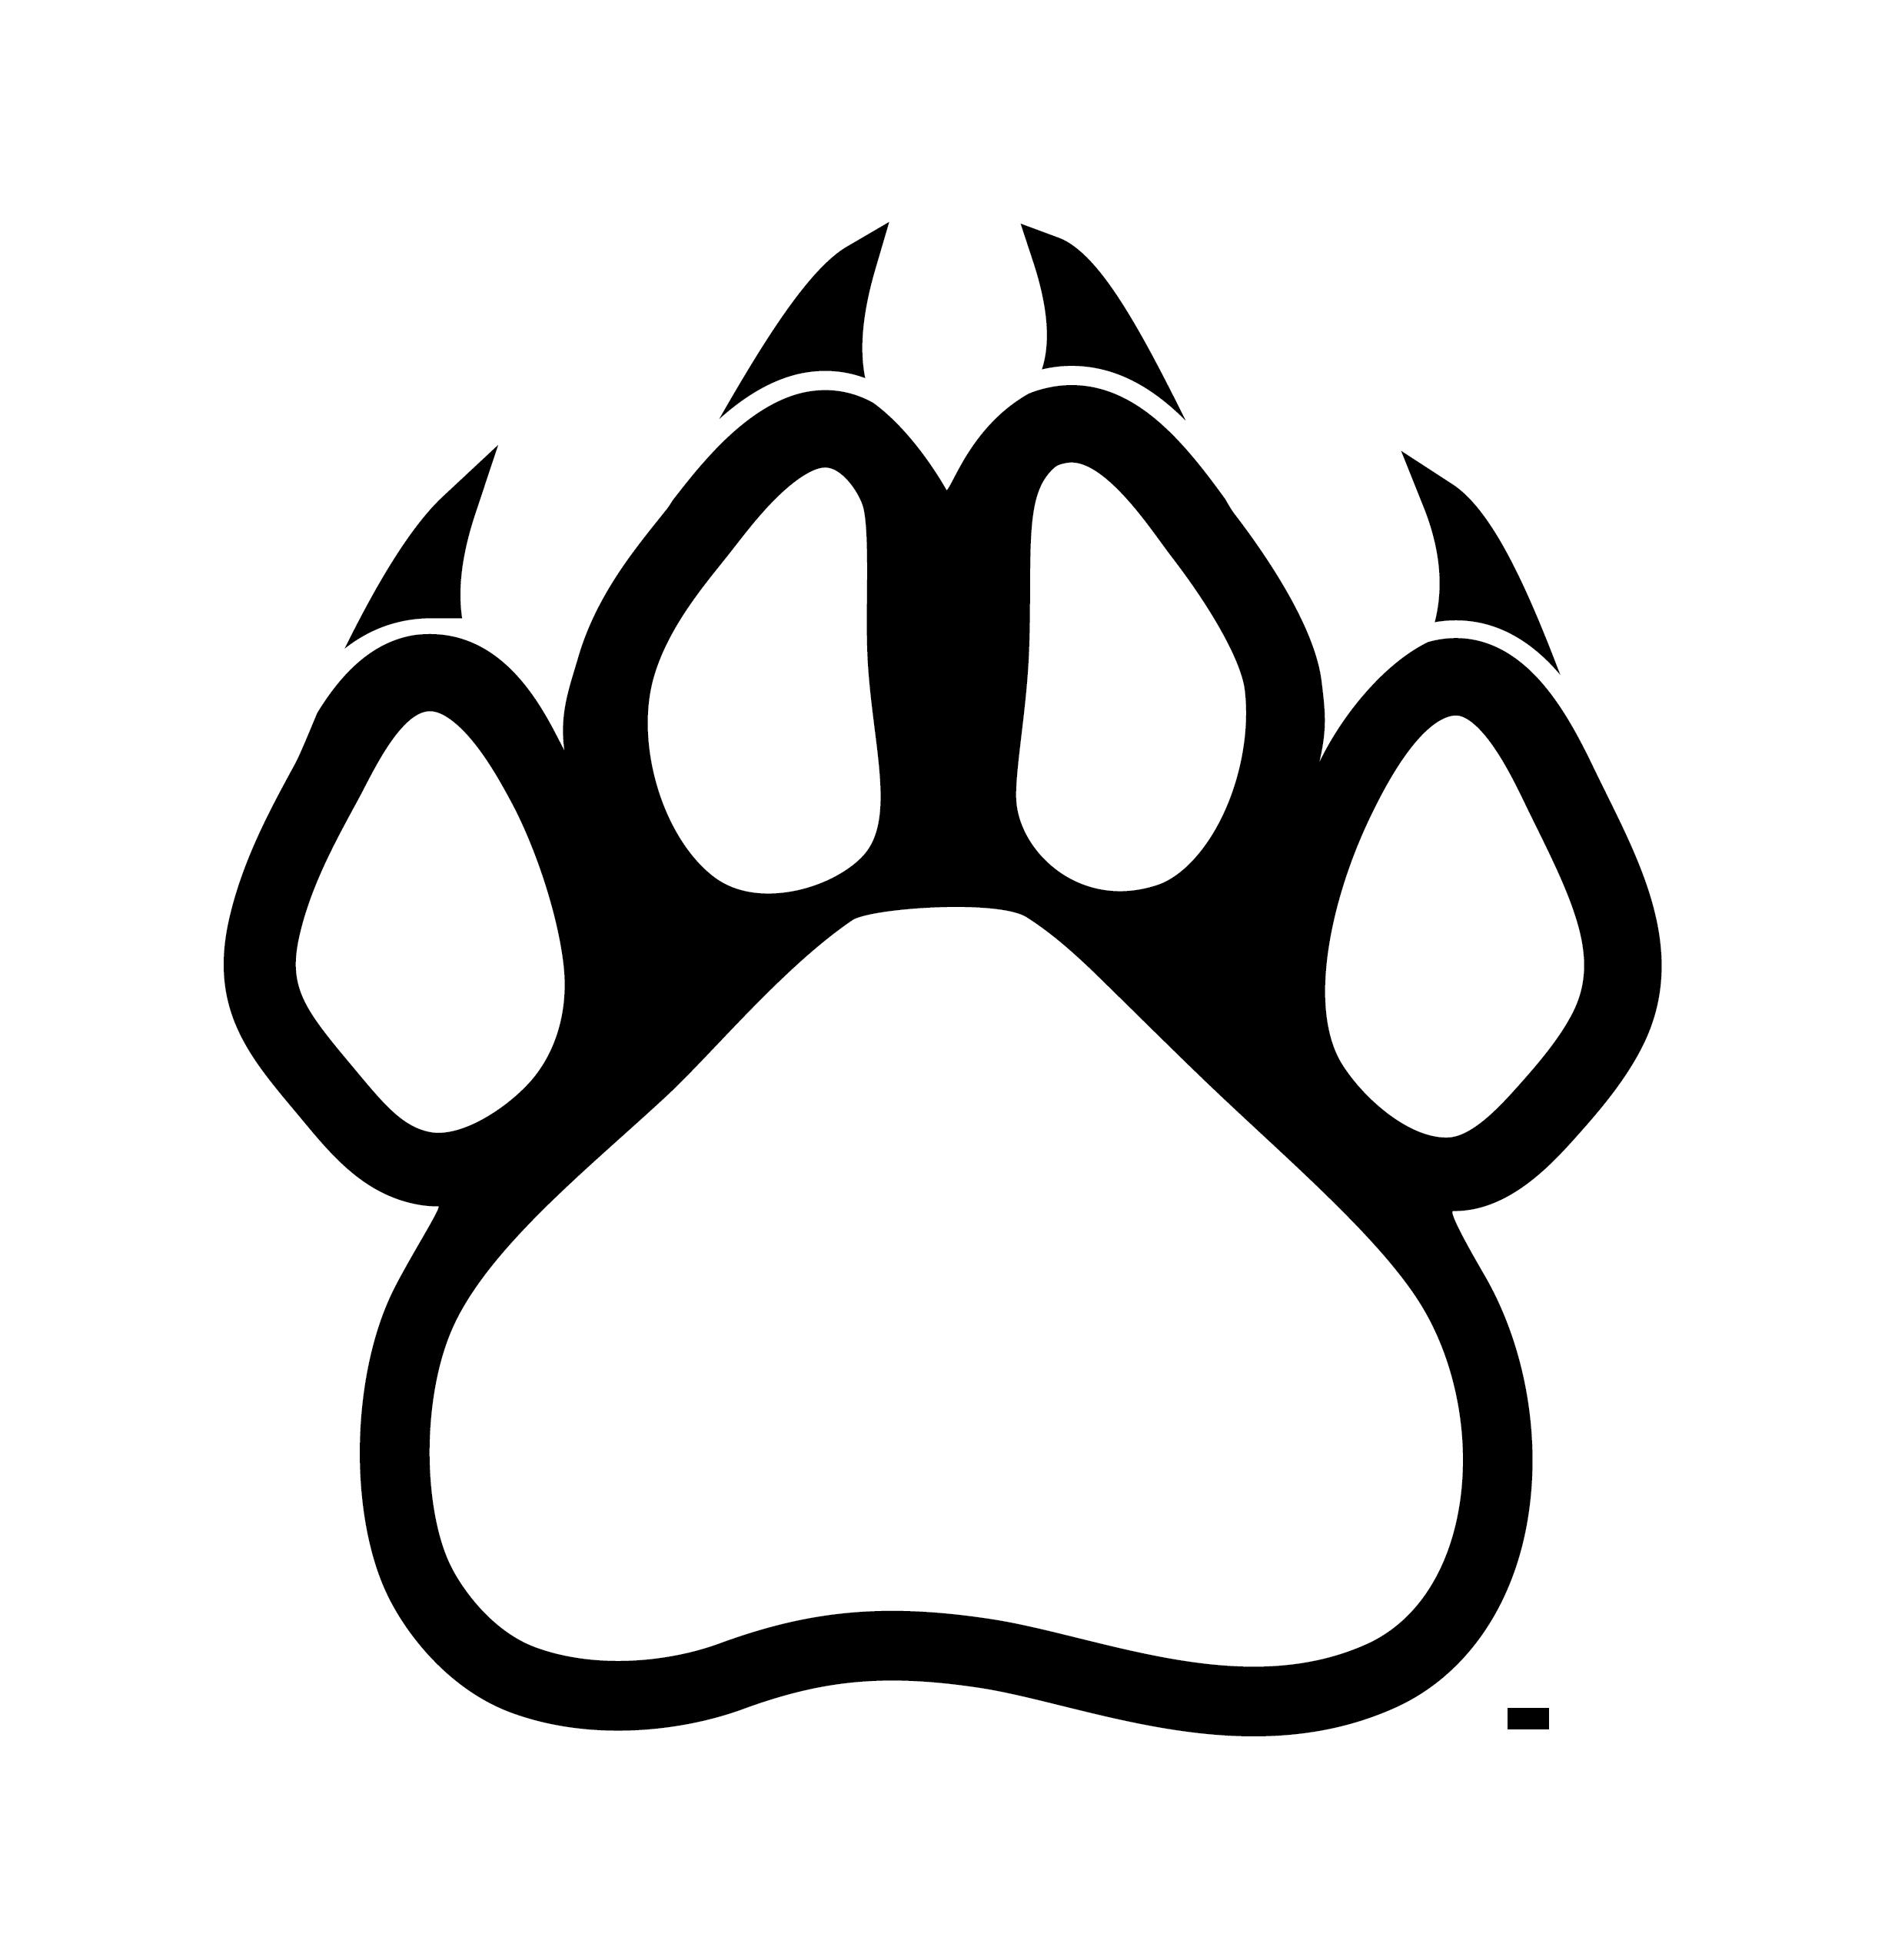 Bobcat clipart lion paw Bear Bear 3 wikiclipart scratch